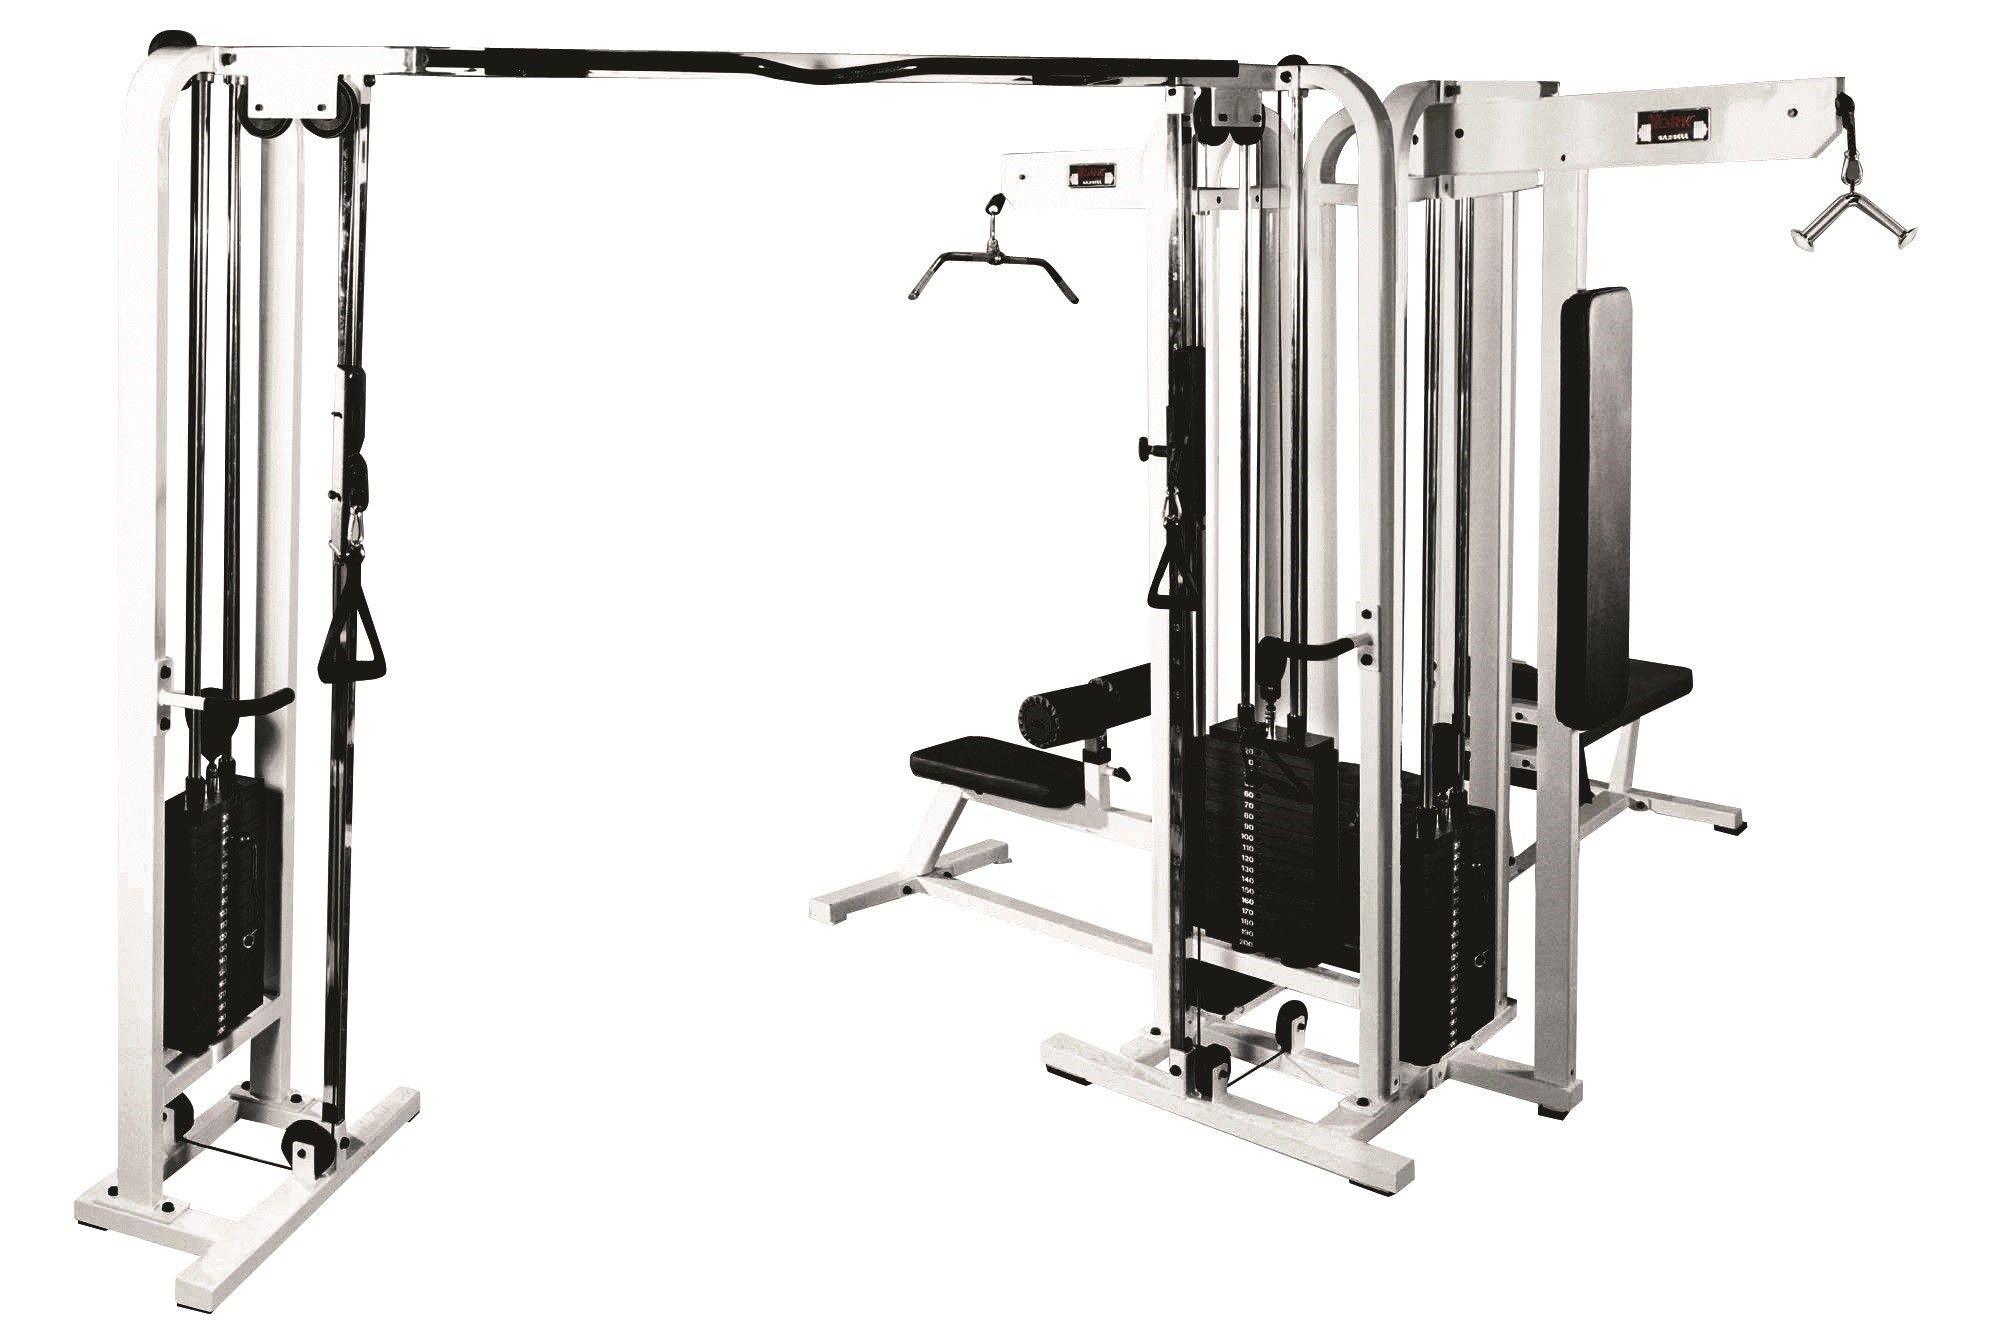 Homcom Multi Gym Workstation Home Workout Station Toning Body Building